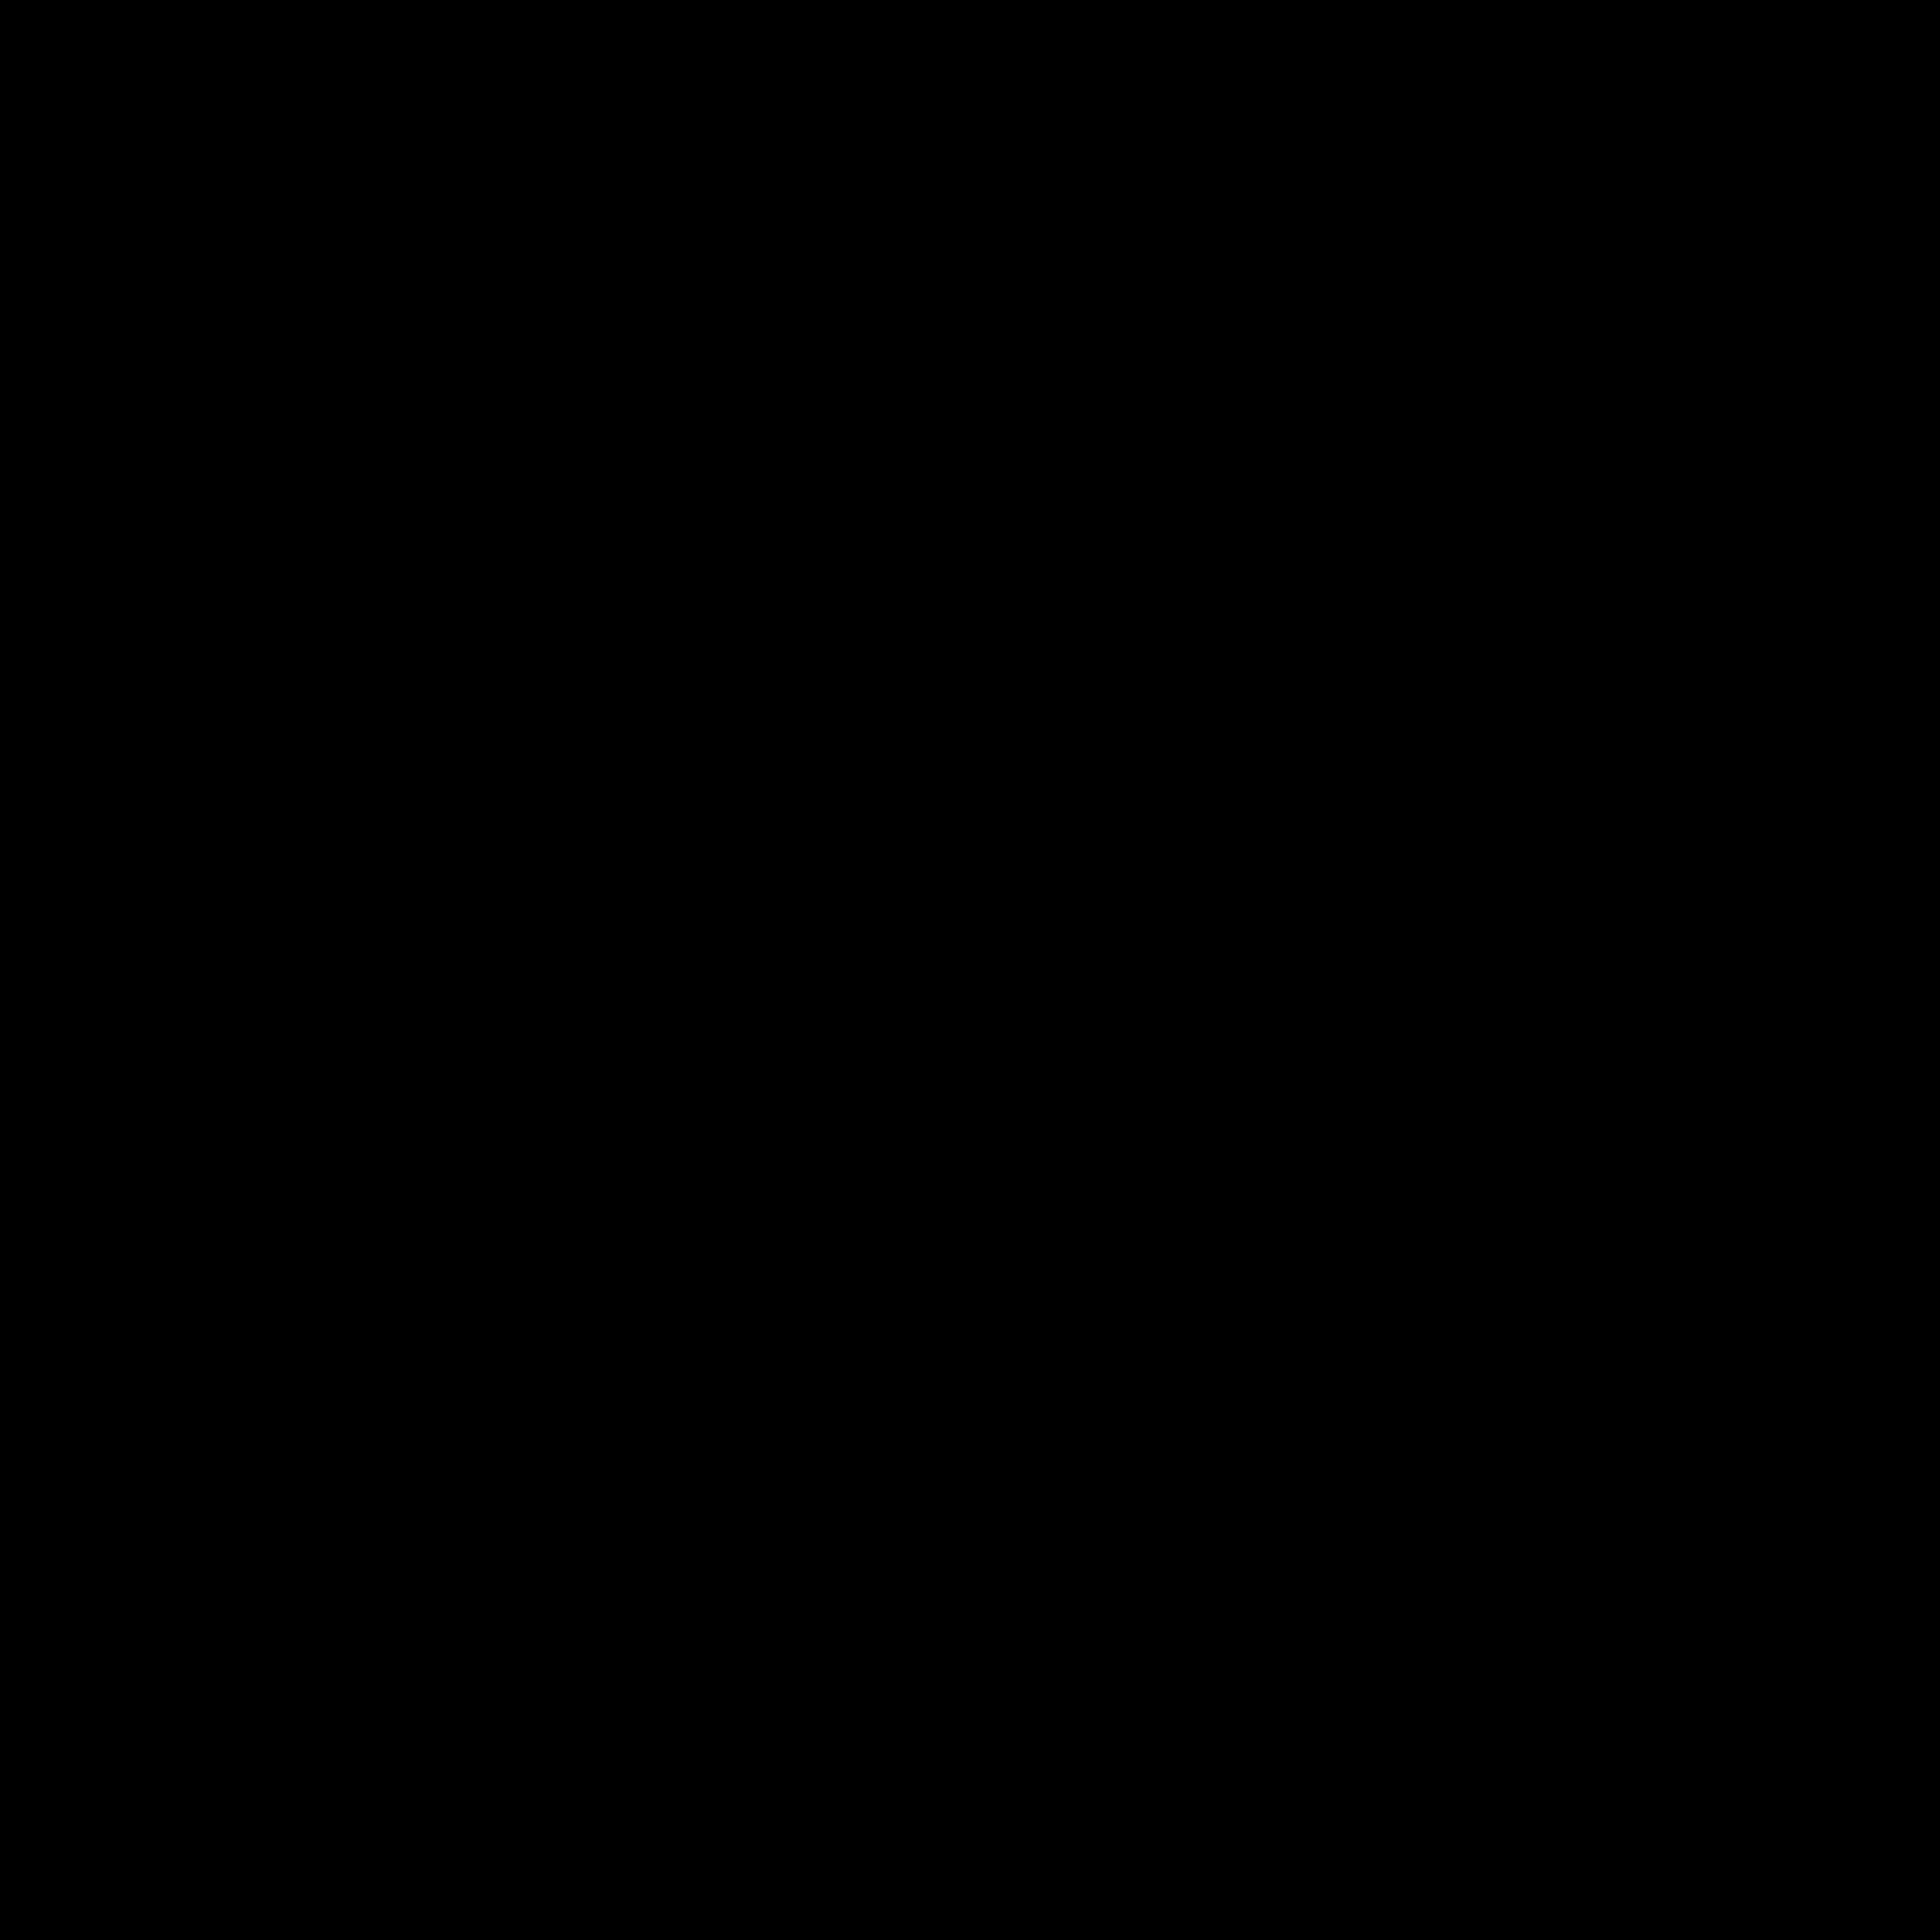 Sun moon earth pluto mars venus astrology clipart clipart library stock SkyCode Horoscopes for April 23-April 29, 2018 - Unlockastrology.com clipart library stock